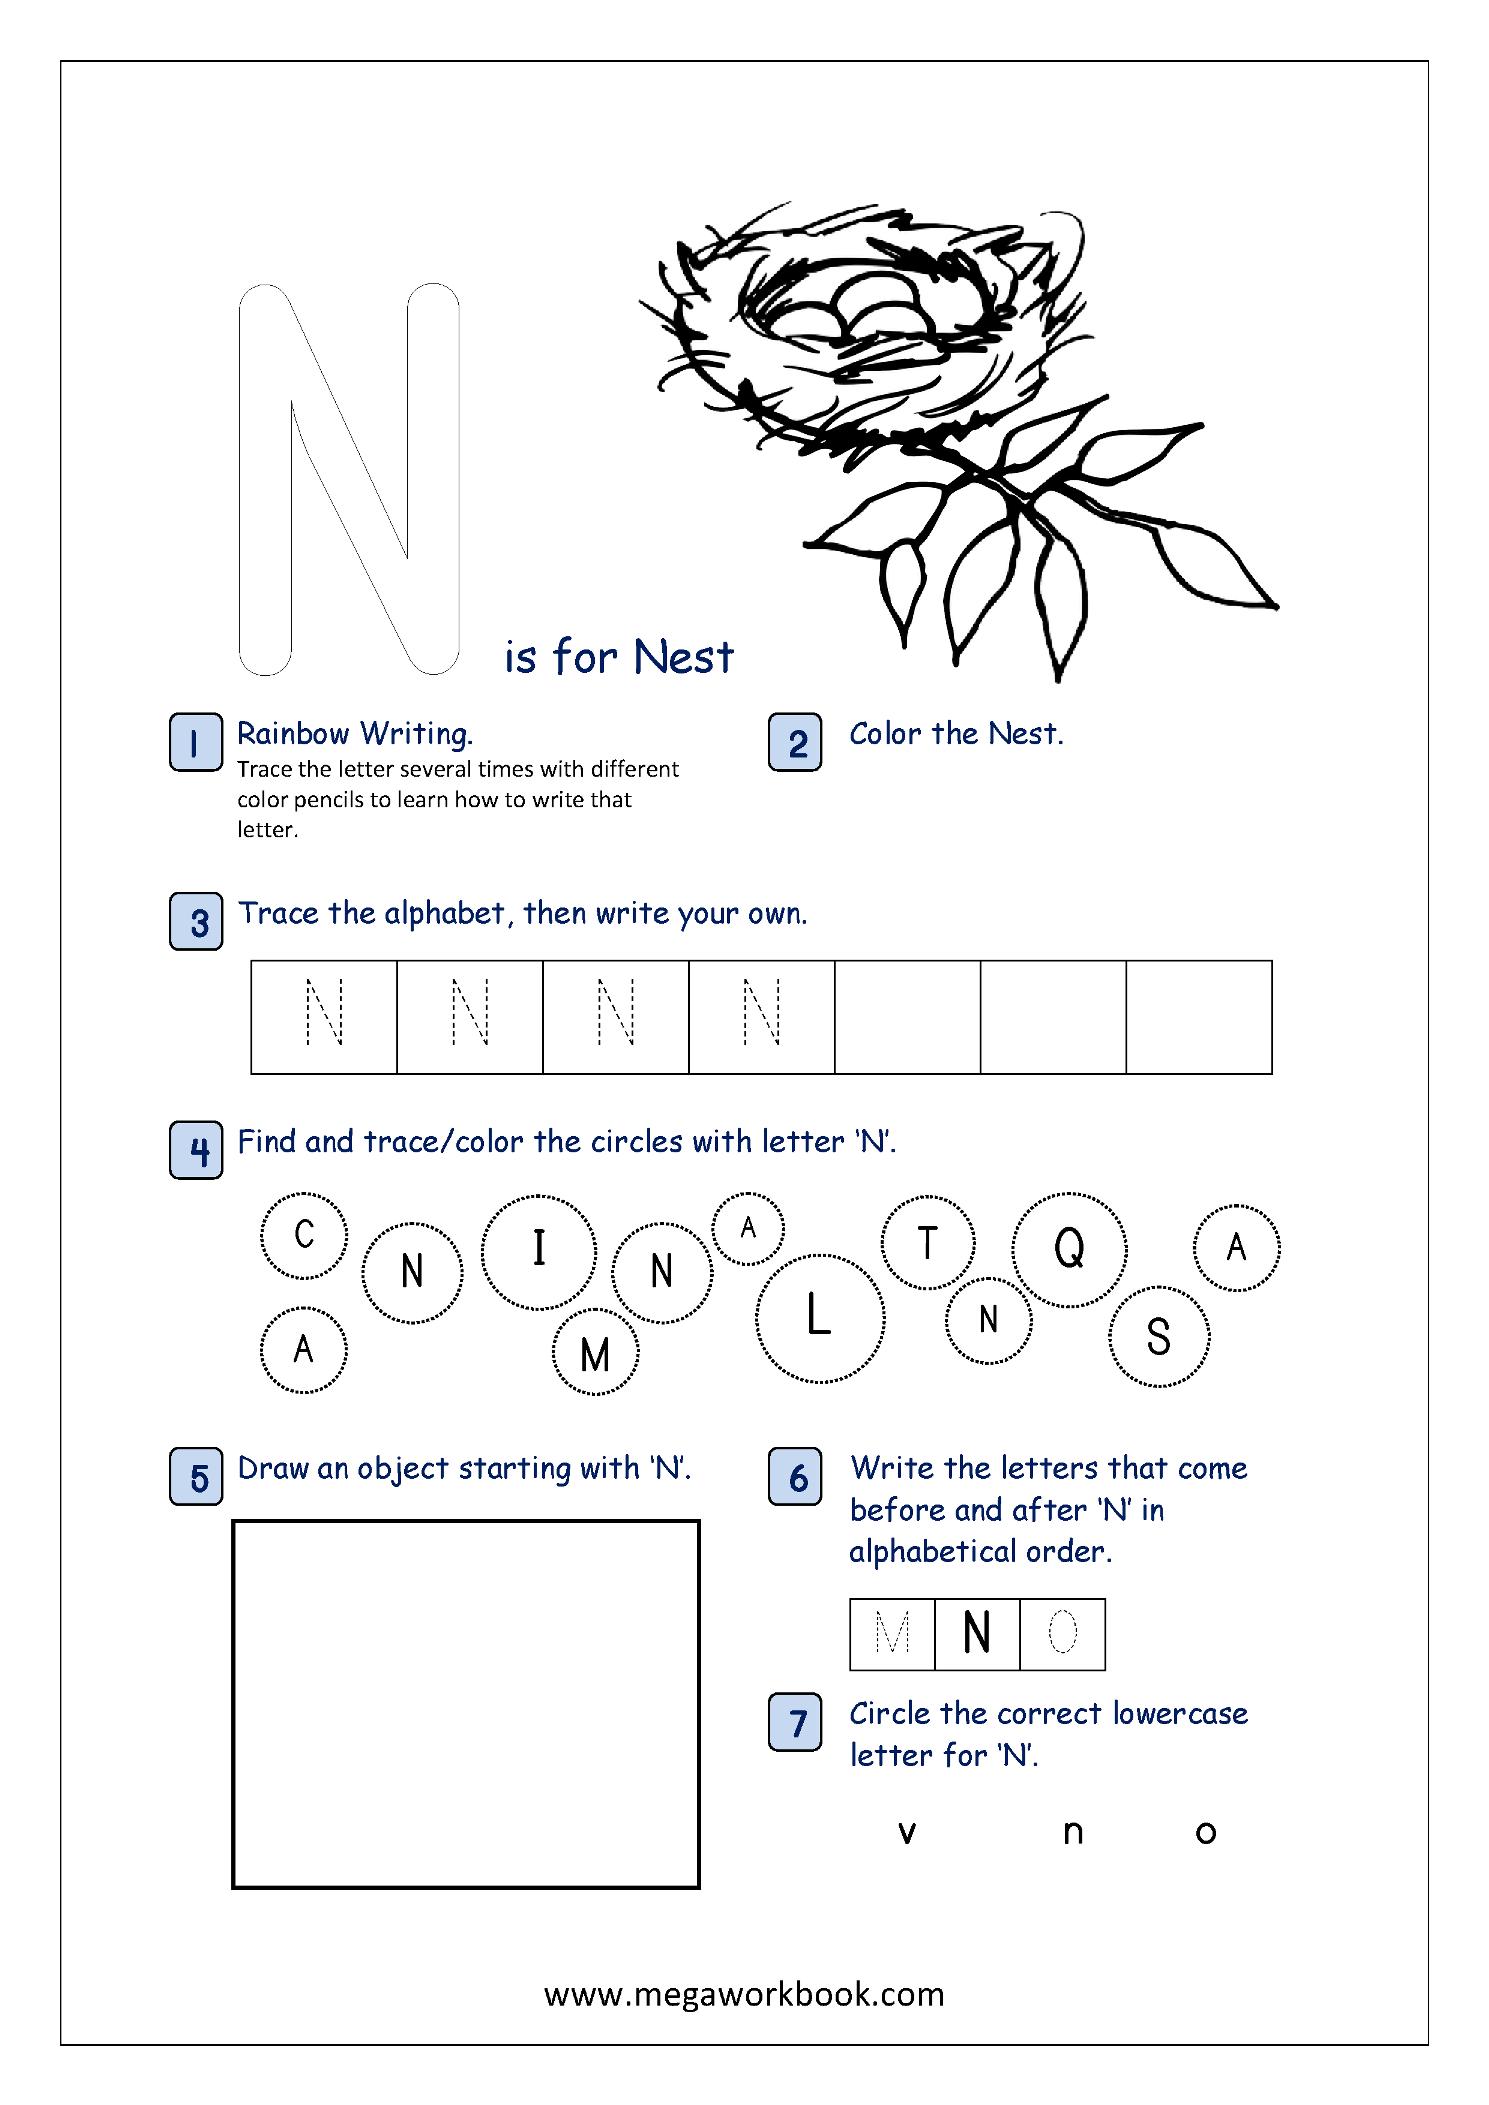 Alphabet Recognition Activity Worksheet - Capital Letter - N ...